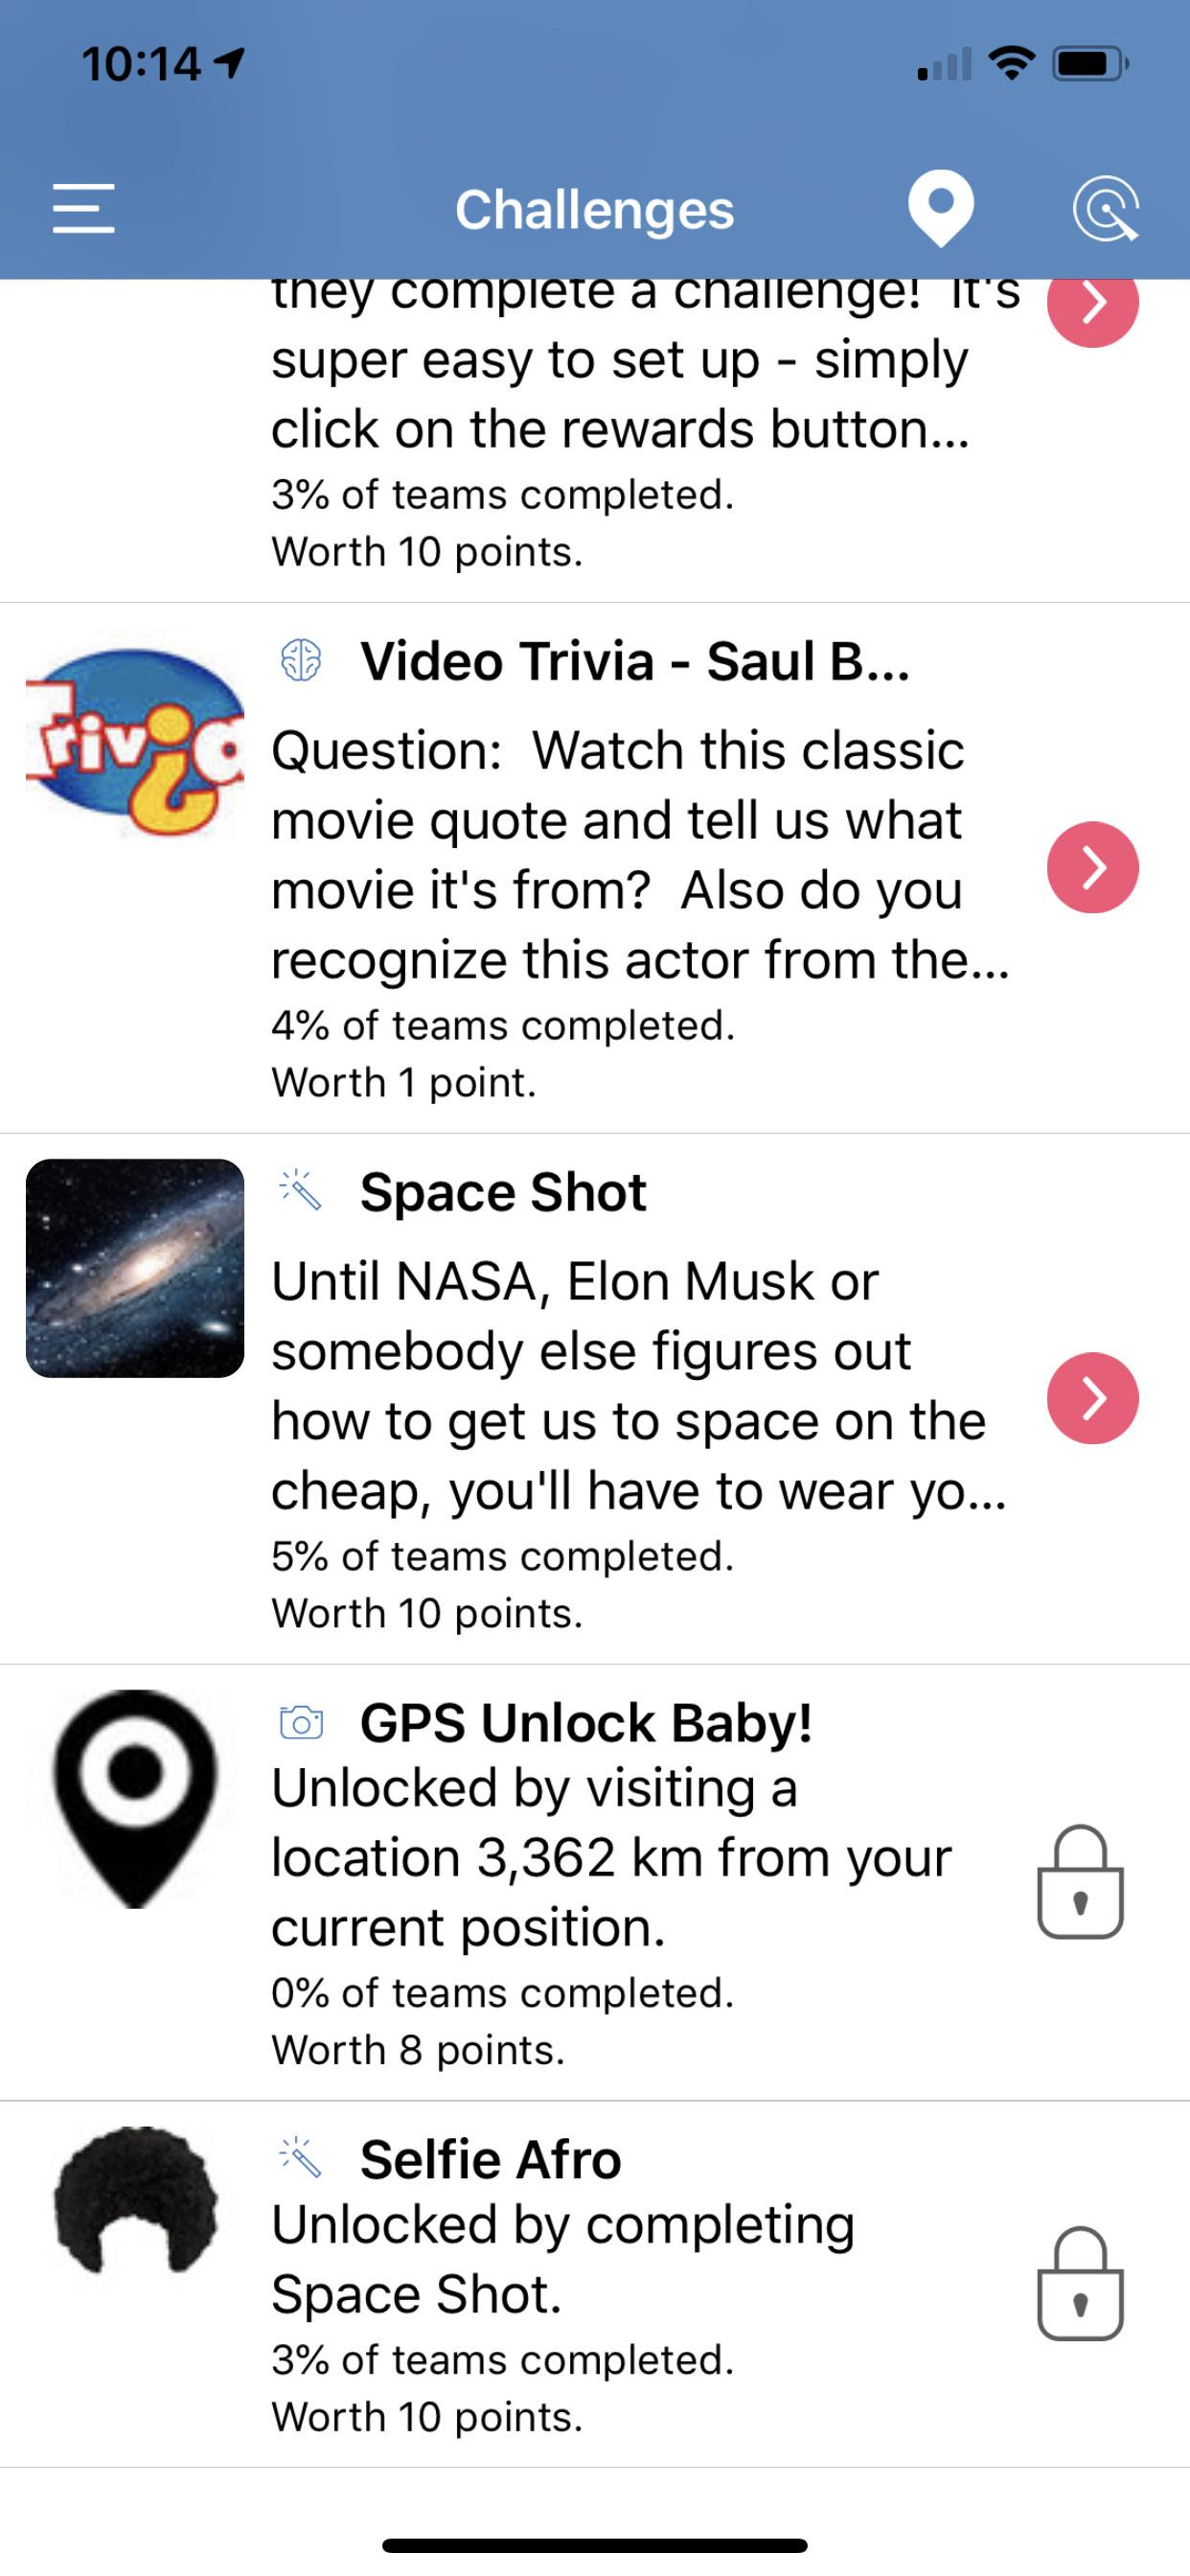 Social Scavenger App Locked to Challenge